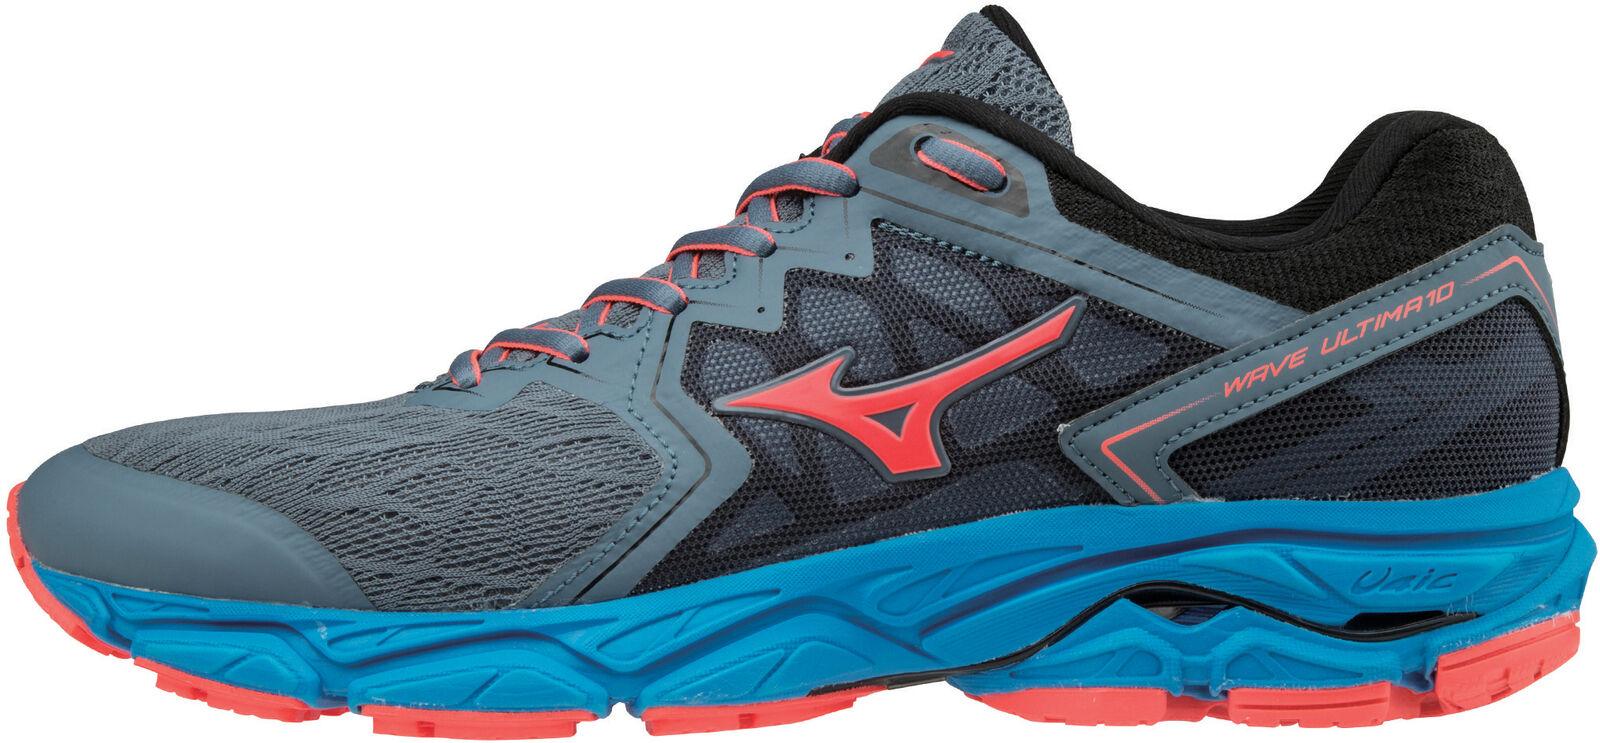 Mizuno Wave Ultima 10 Damenschuhe Running Schuhes - Blau